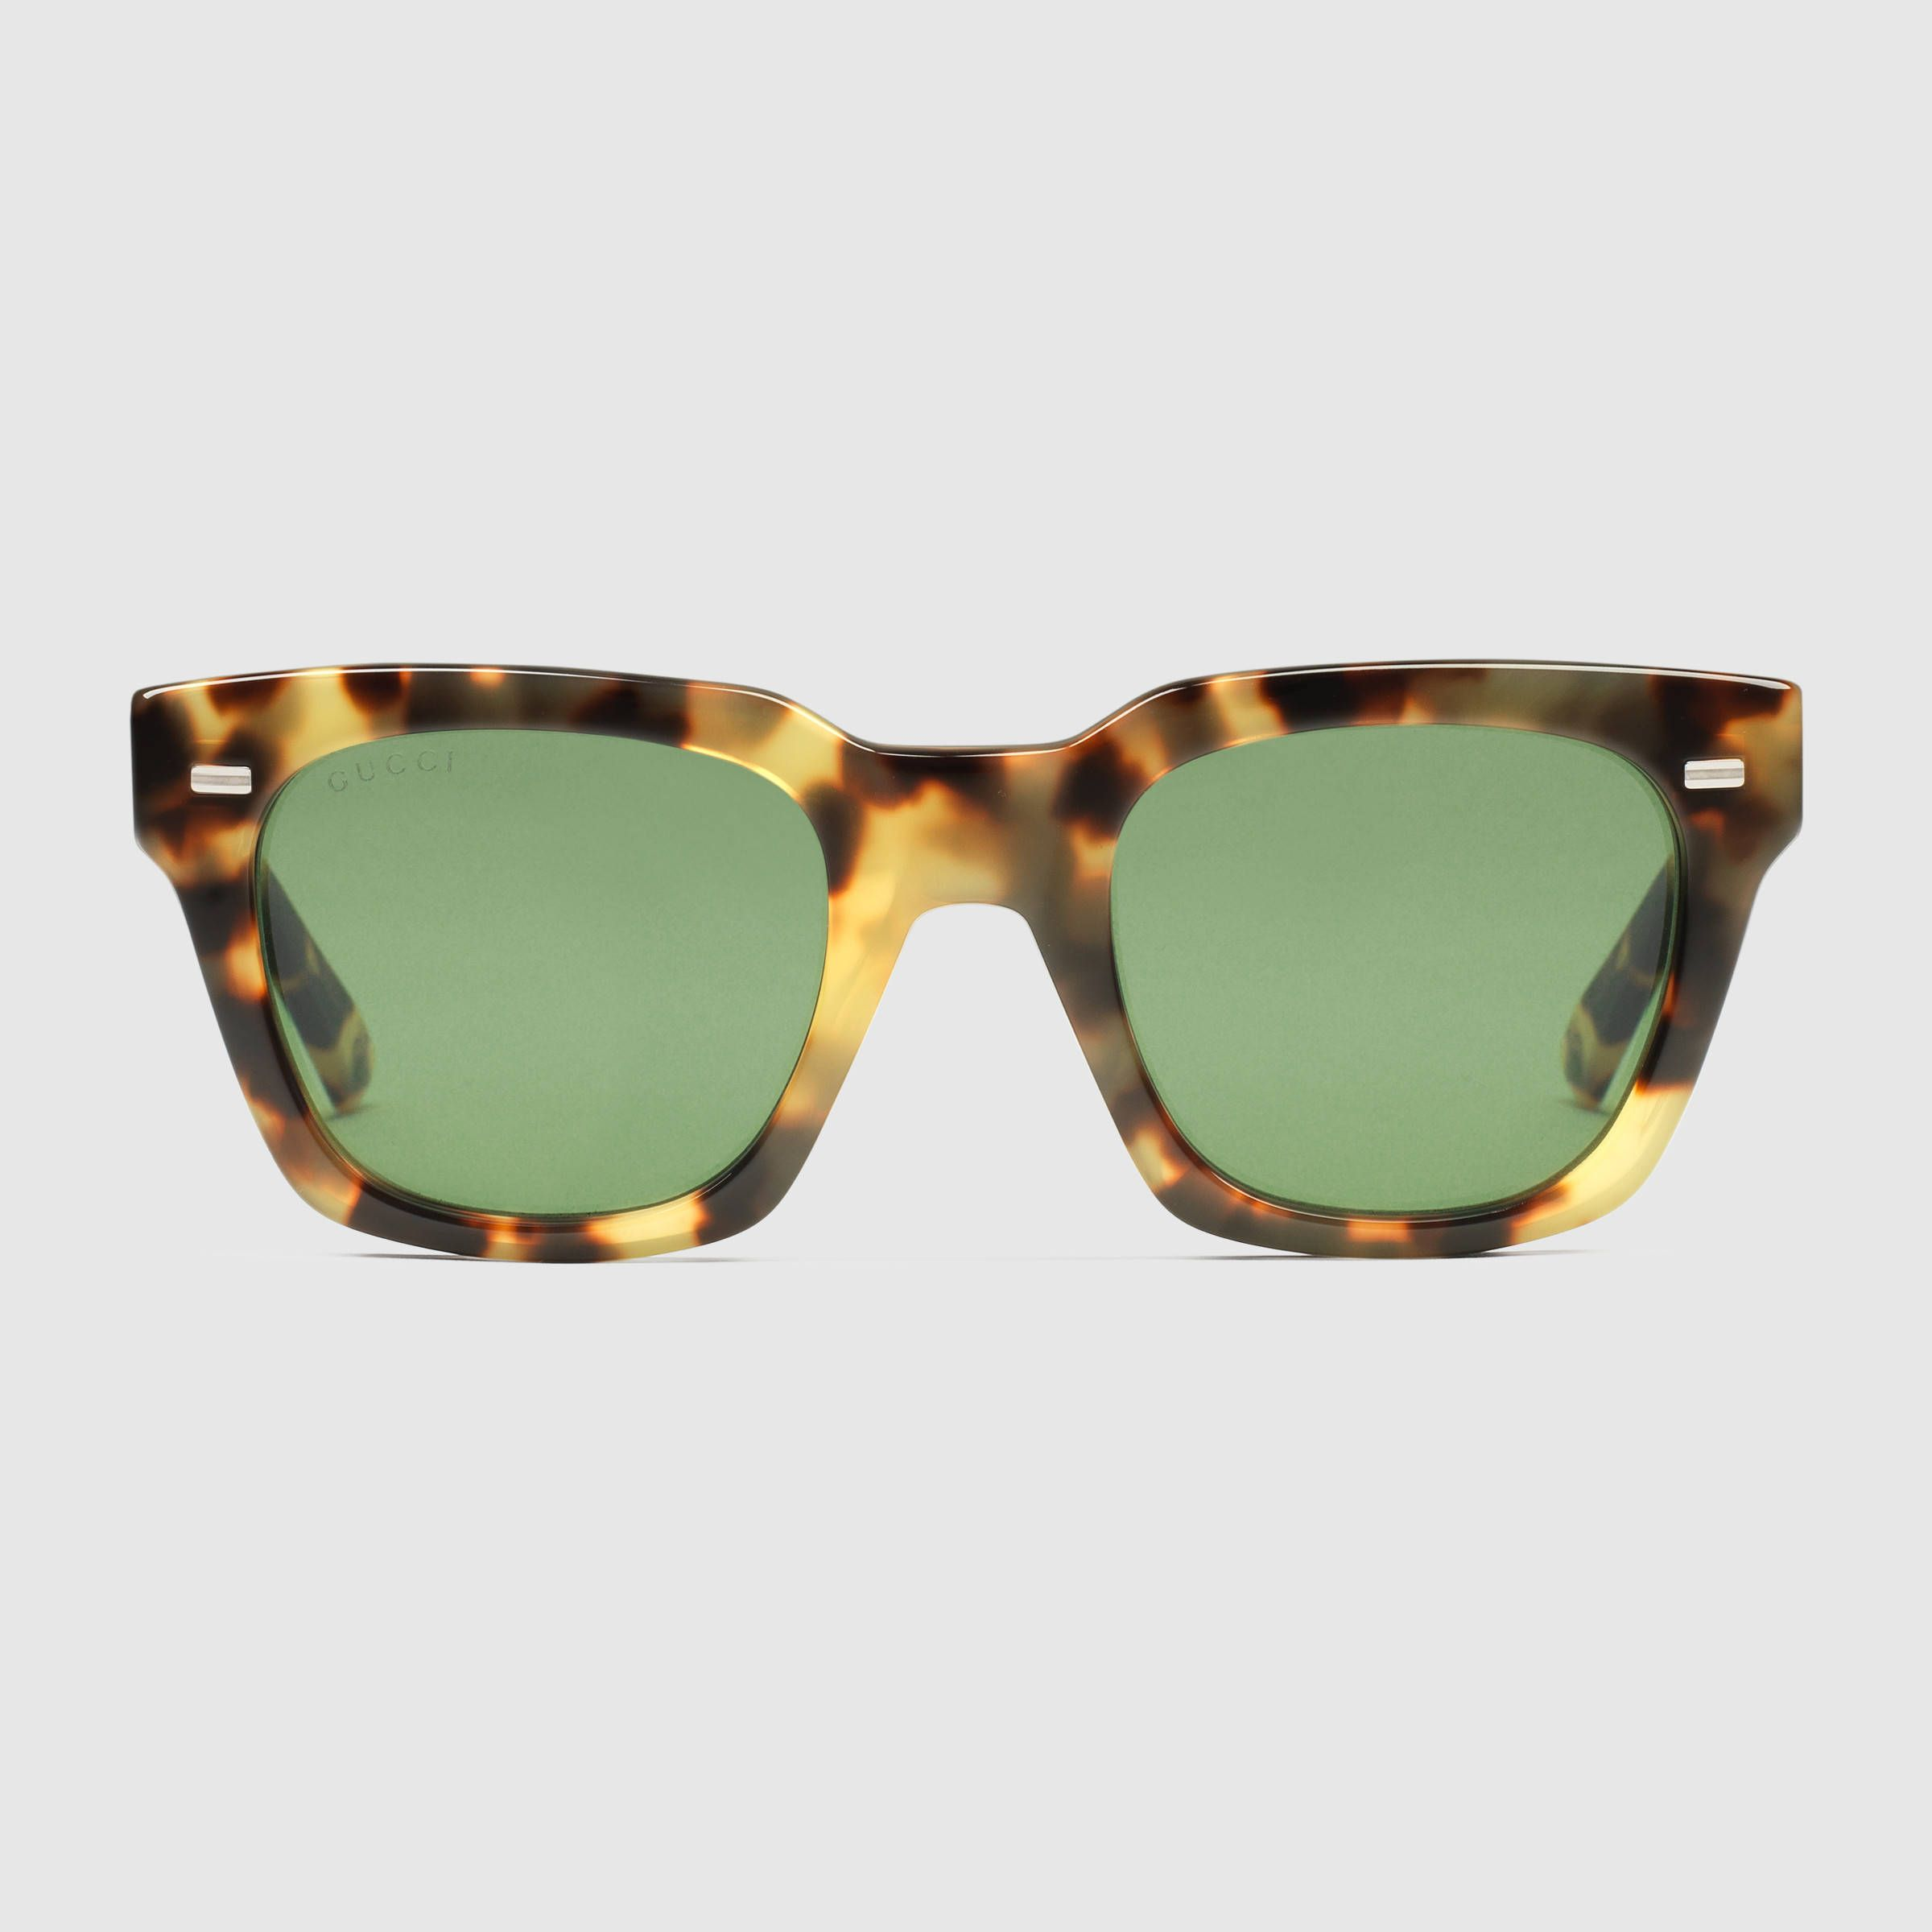 13f70fb7efe Gucci Men - Havana square-frame sunglasses - 380090J07407017 ...